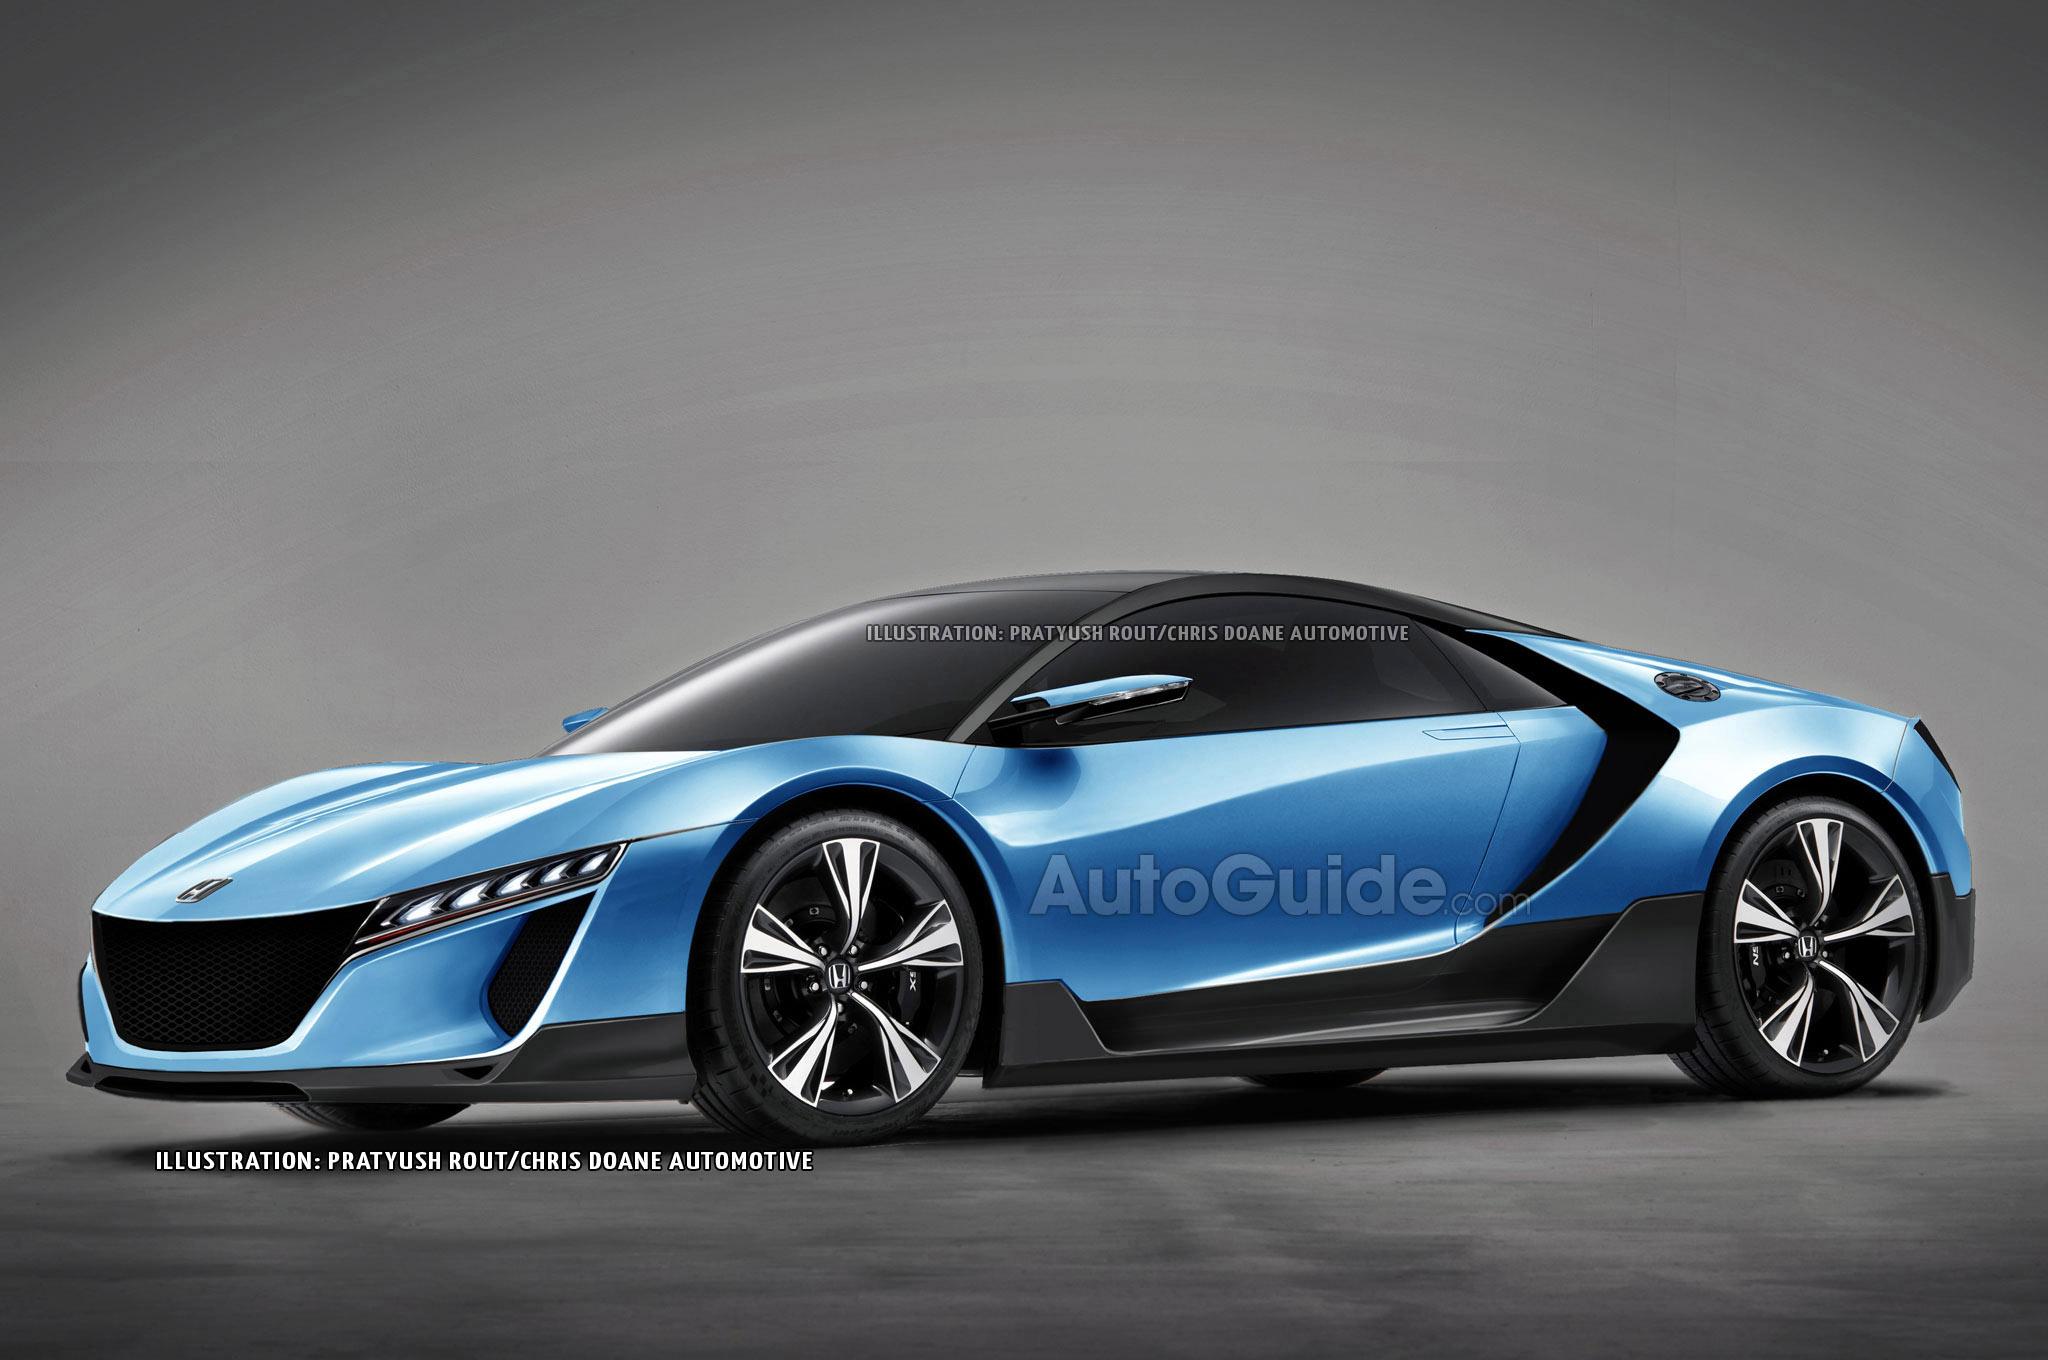 http://autoguide.com.vsassets.com/blog/wp-content/gallery/baby-honda-nsx/Honda-Baby-NSX-3.jpg